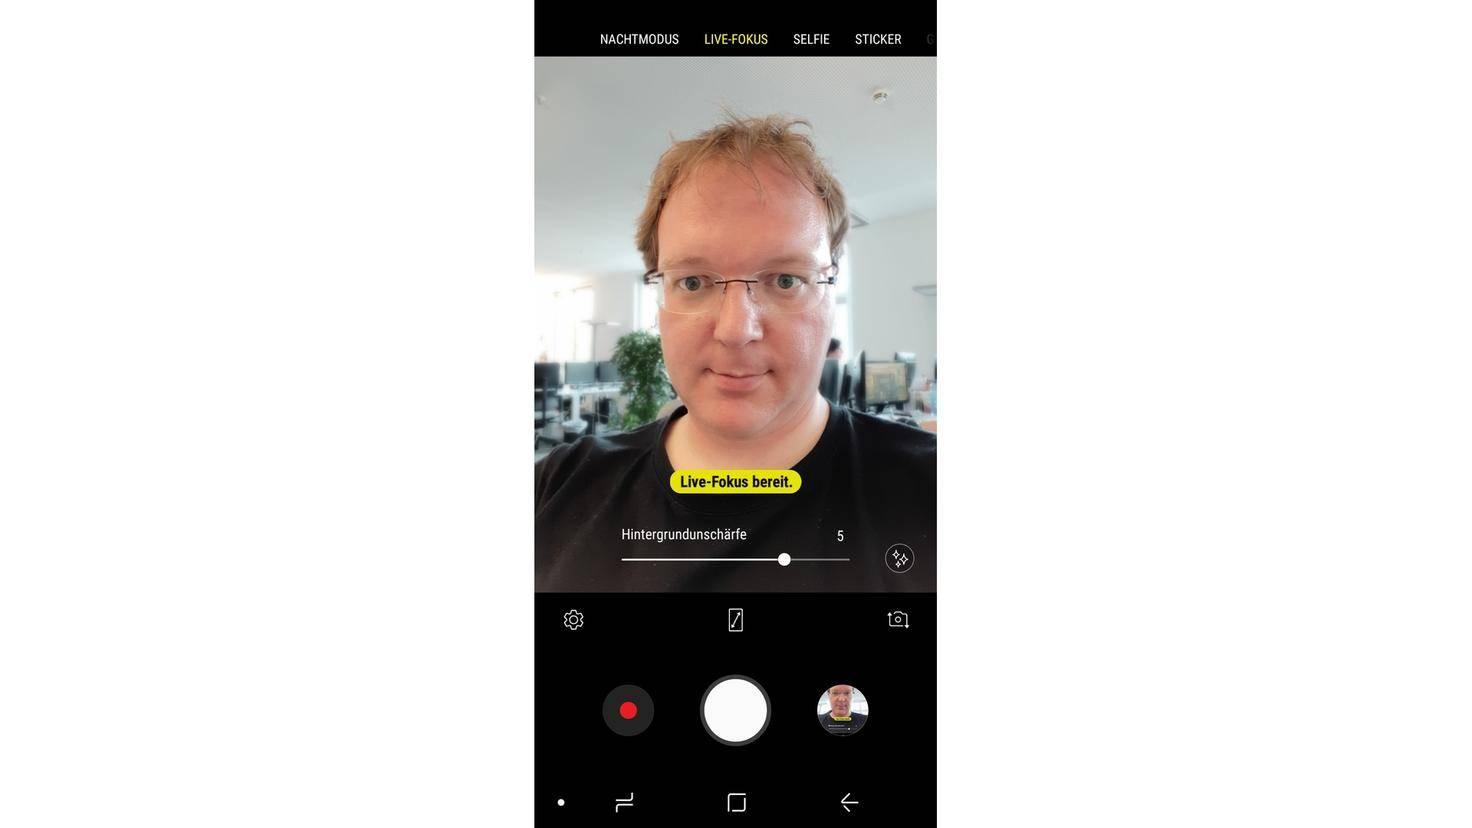 Samsung-Galaxy-A8-Selfie